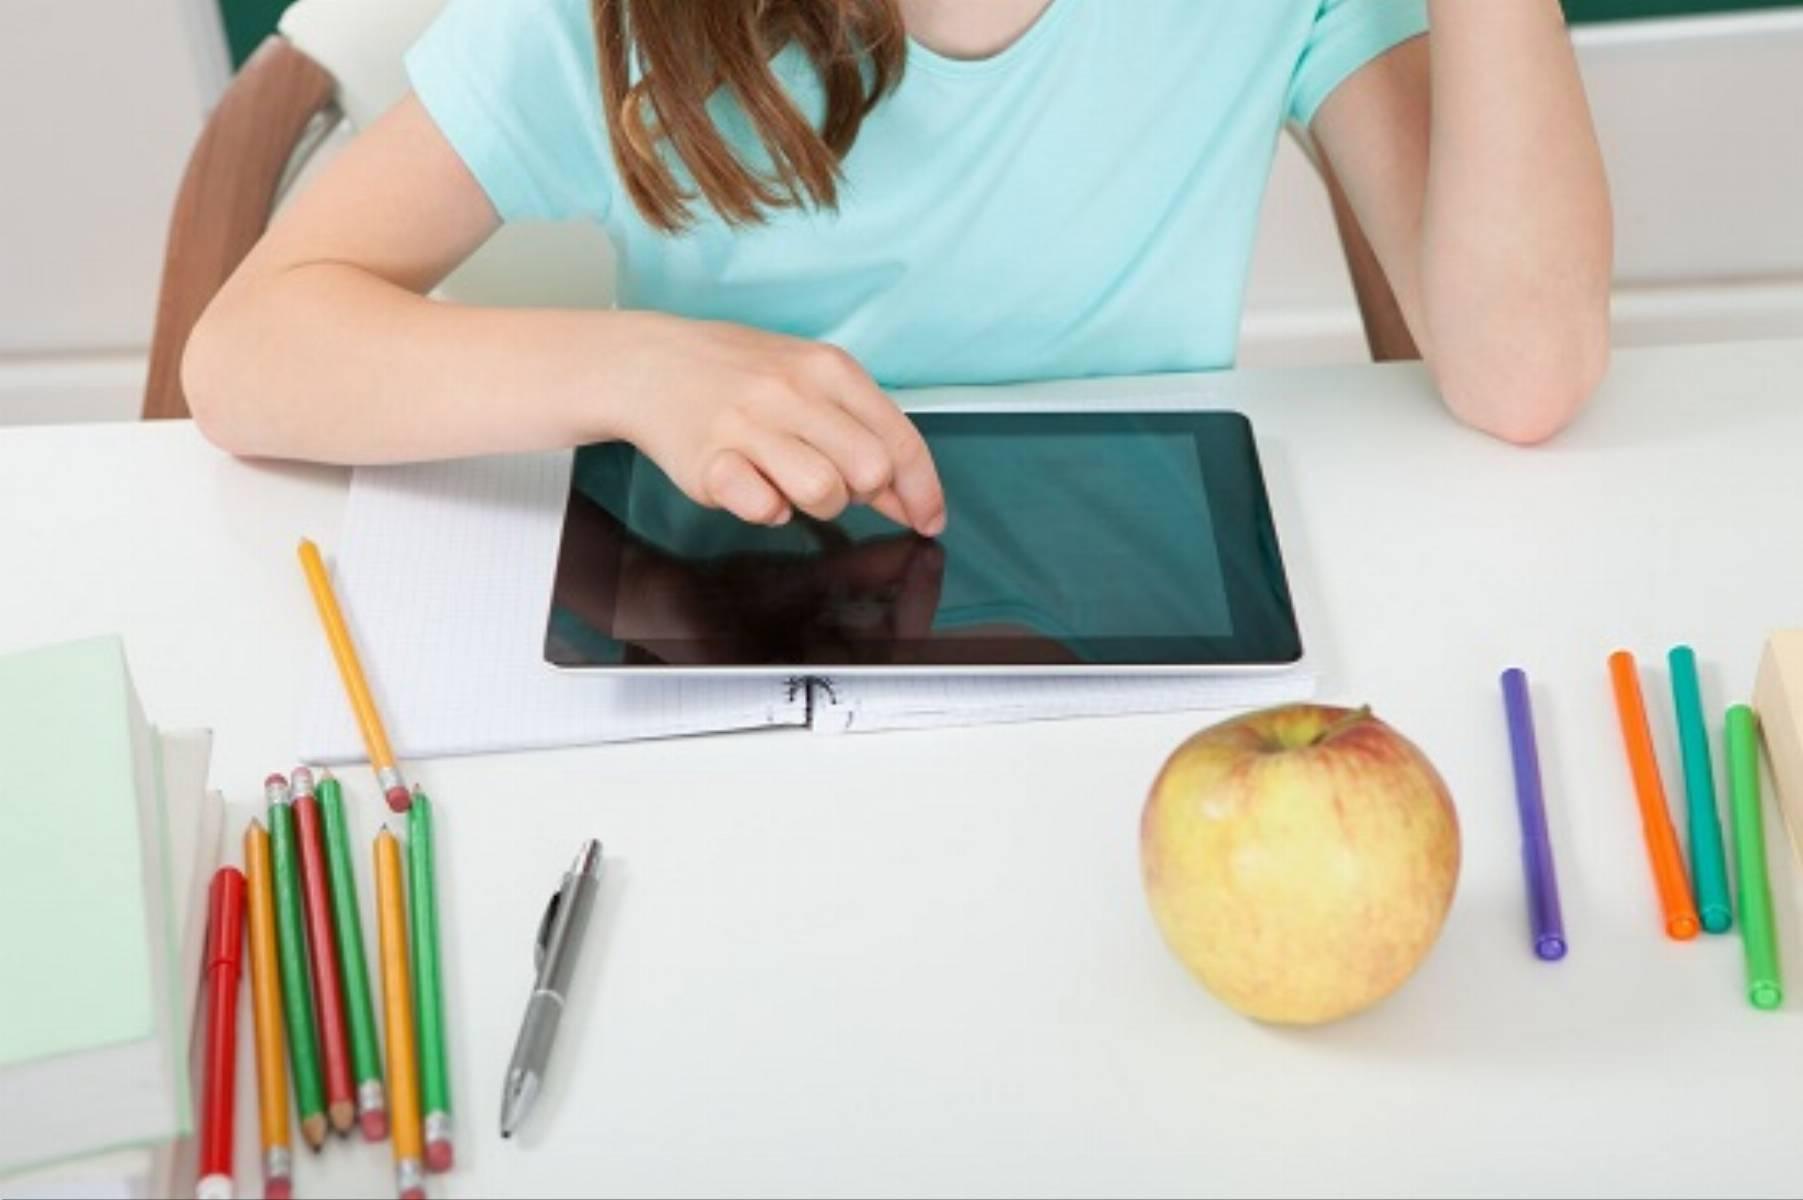 Schoolgirl Touching Digital Tablet At Table